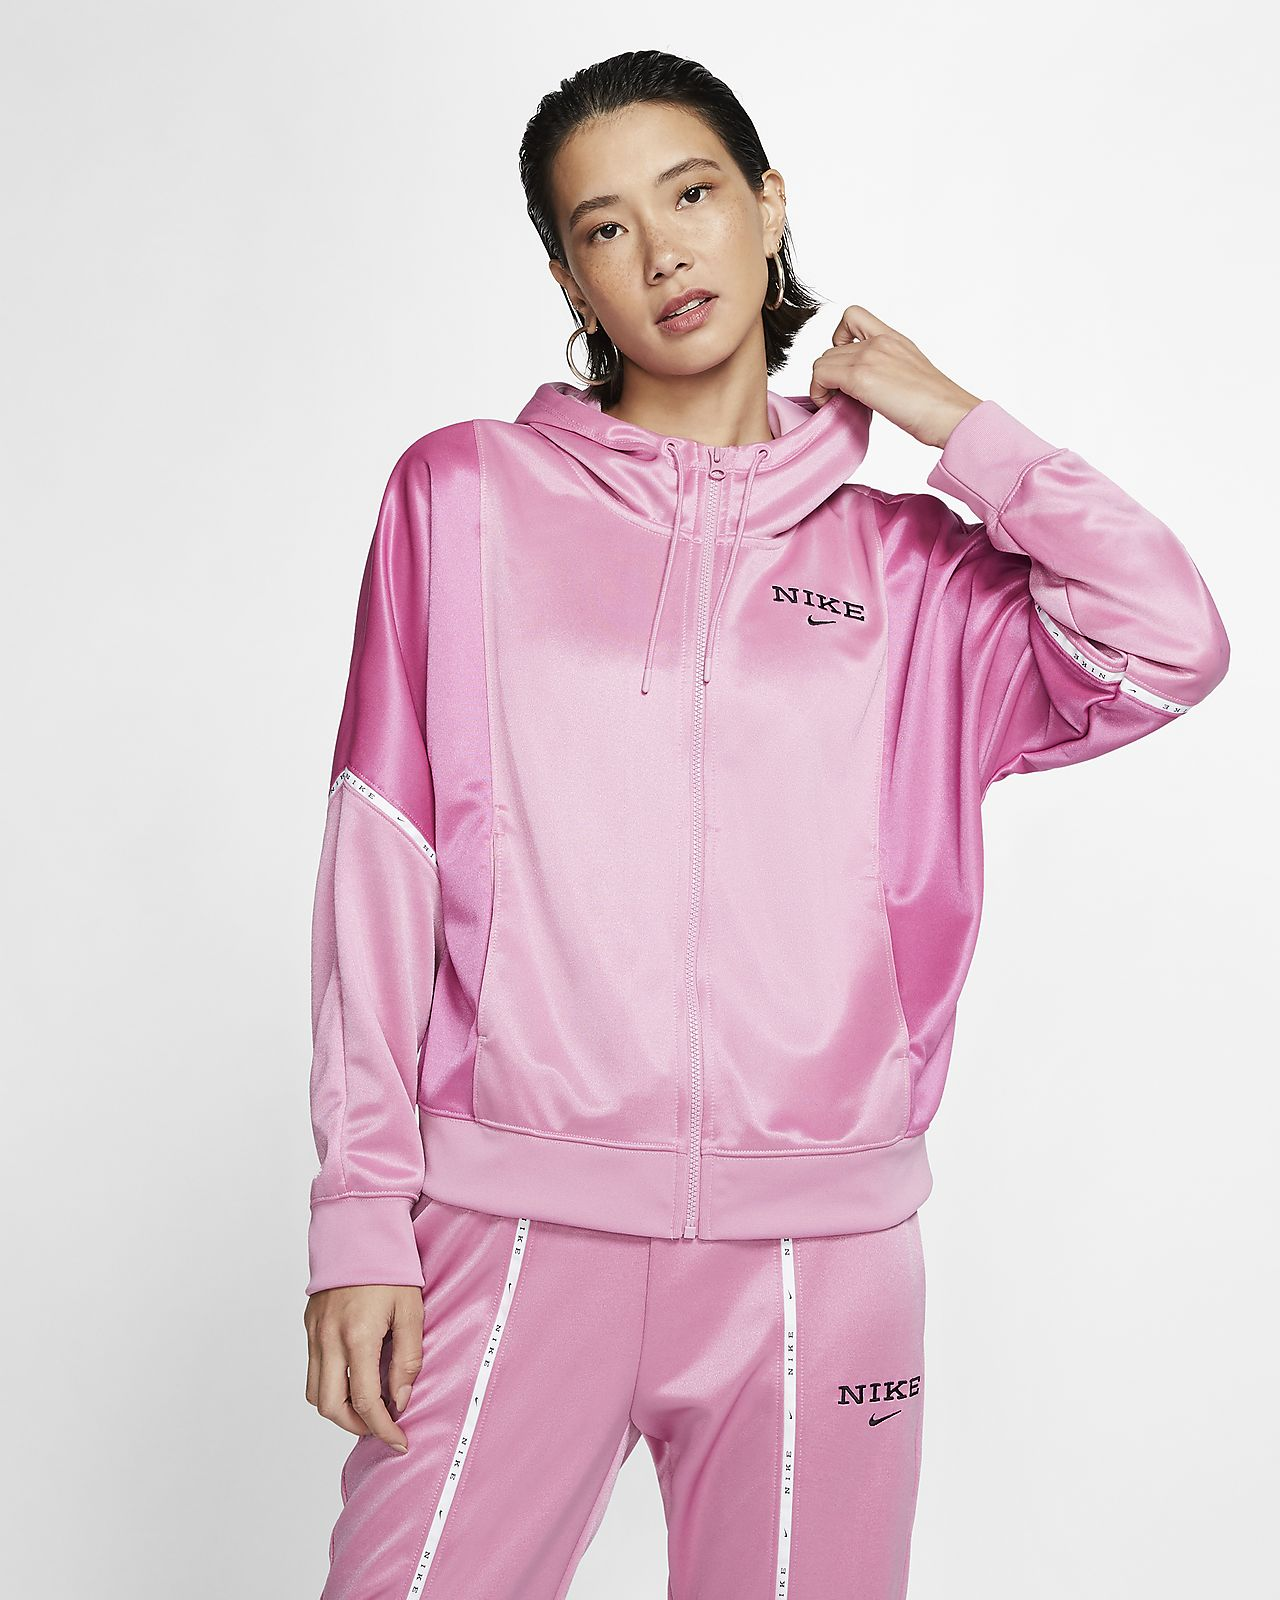 Nike Sportswear Jaqueta amb caputxa i cremallera completa - Dona